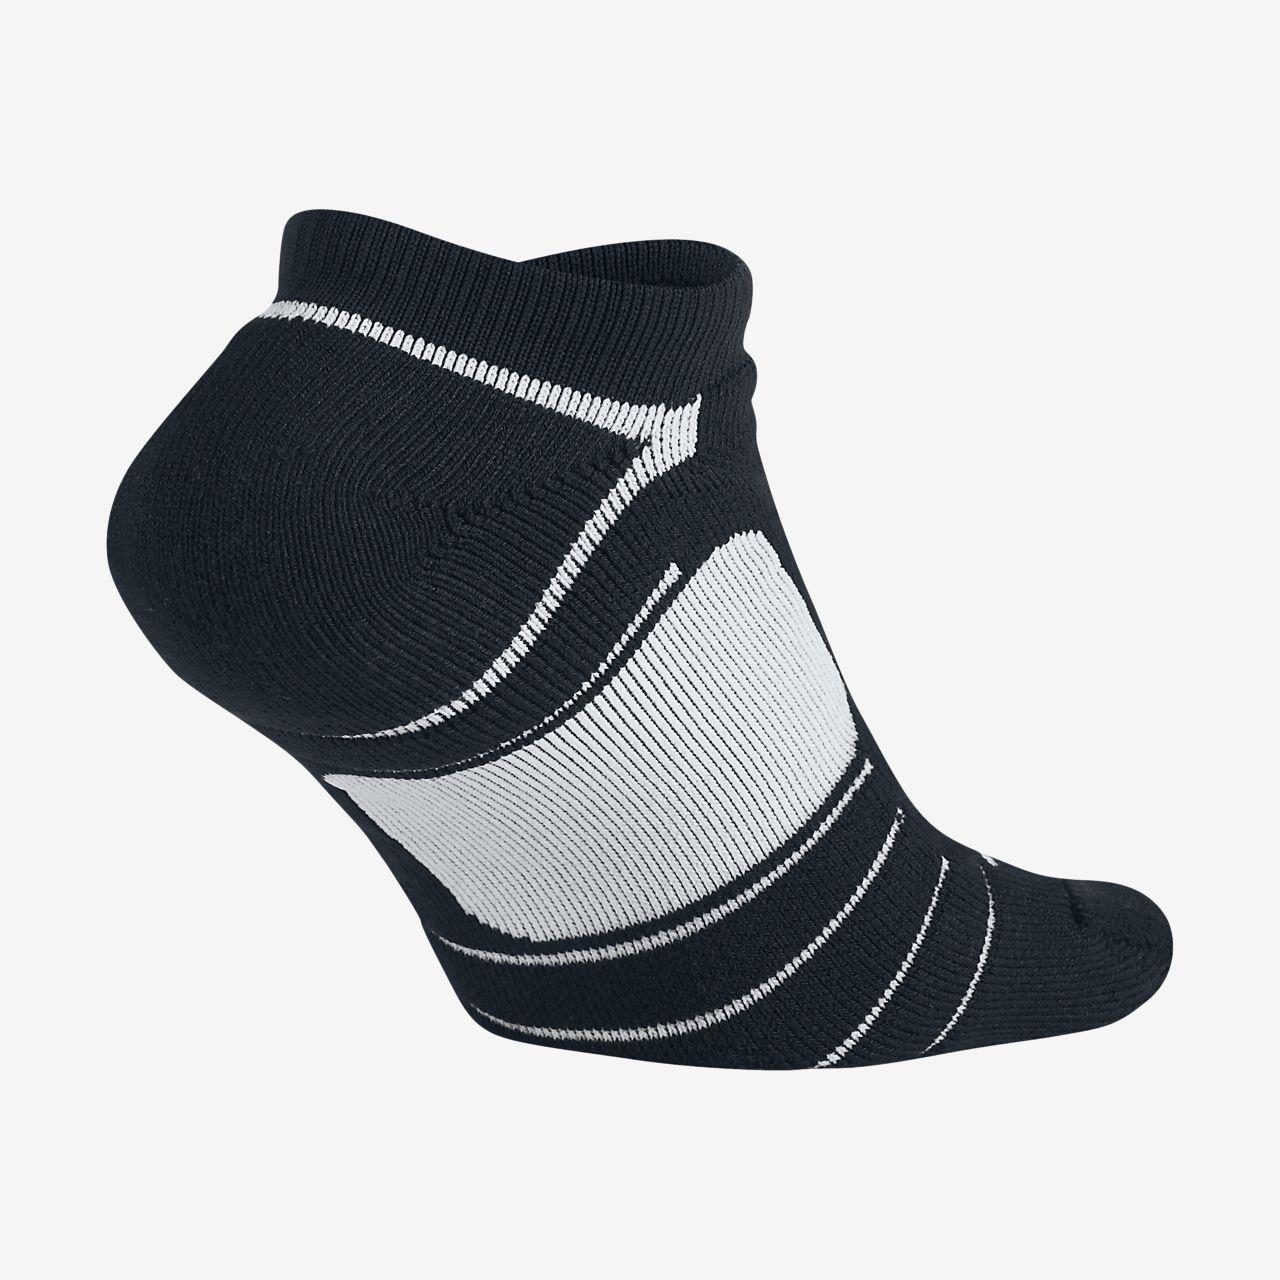 jordan ultimate flight ankle socks